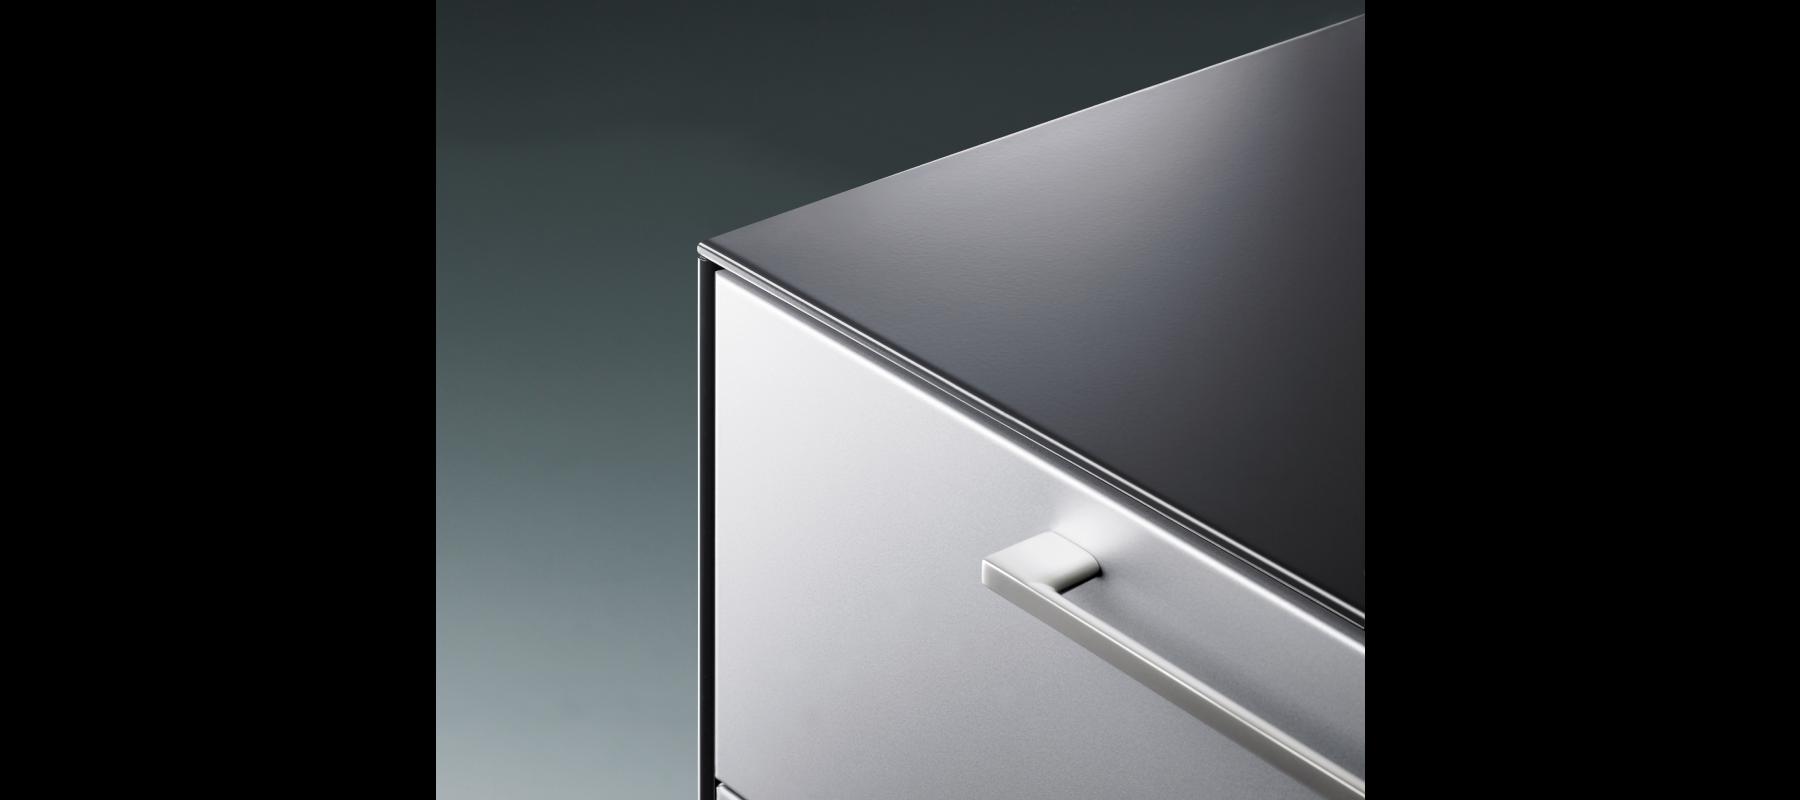 metalowe meble biurowe szafy szufladowe cp detale - 05